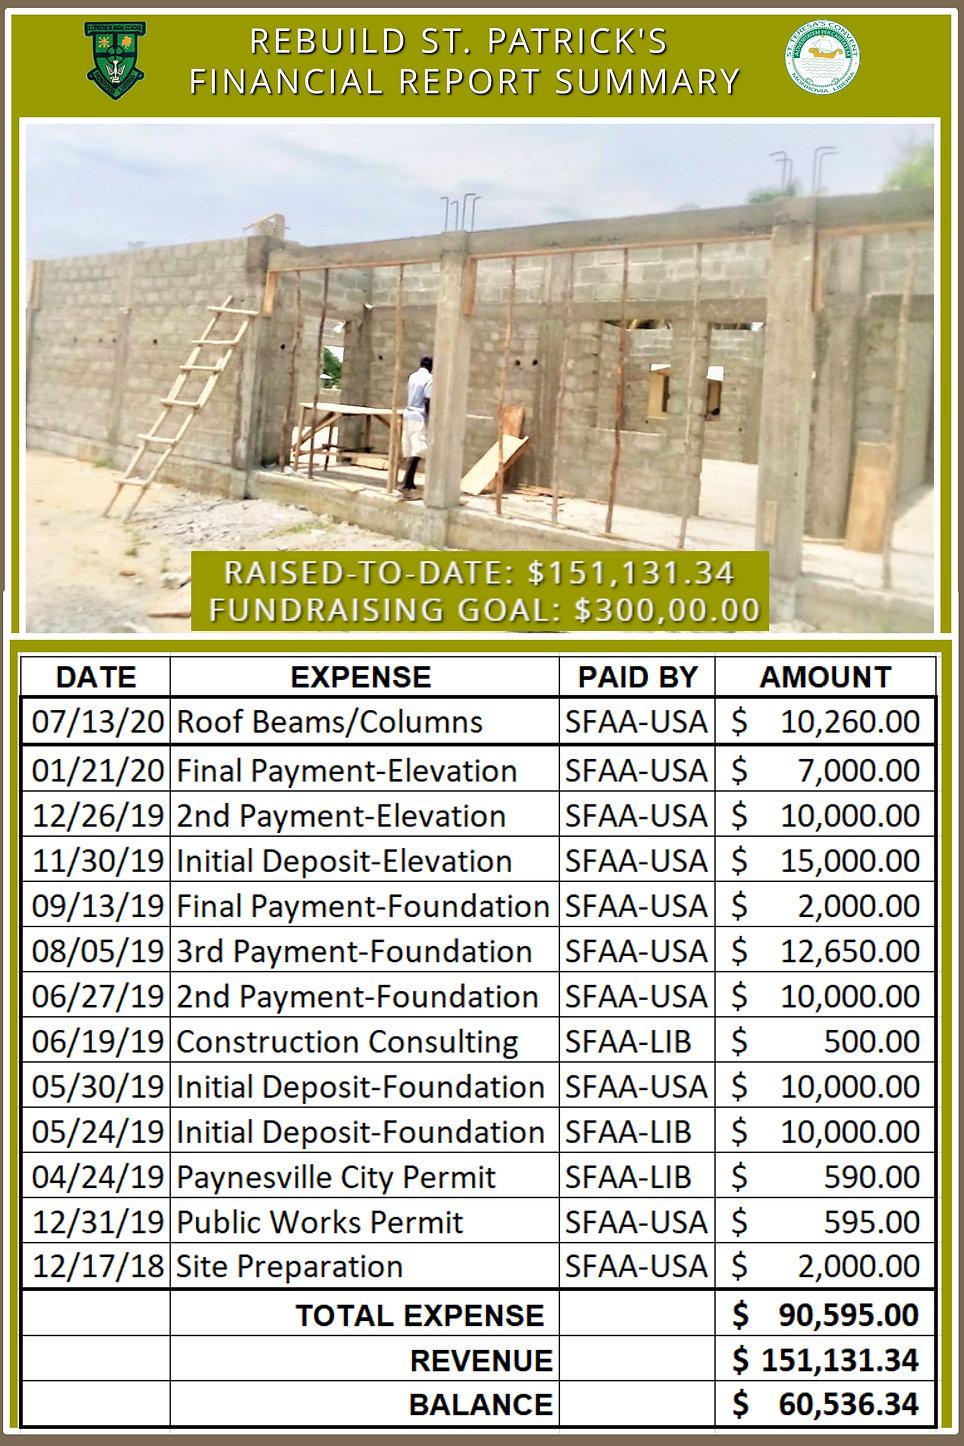 Rebuild St Pats Financial Summary 7-22-2